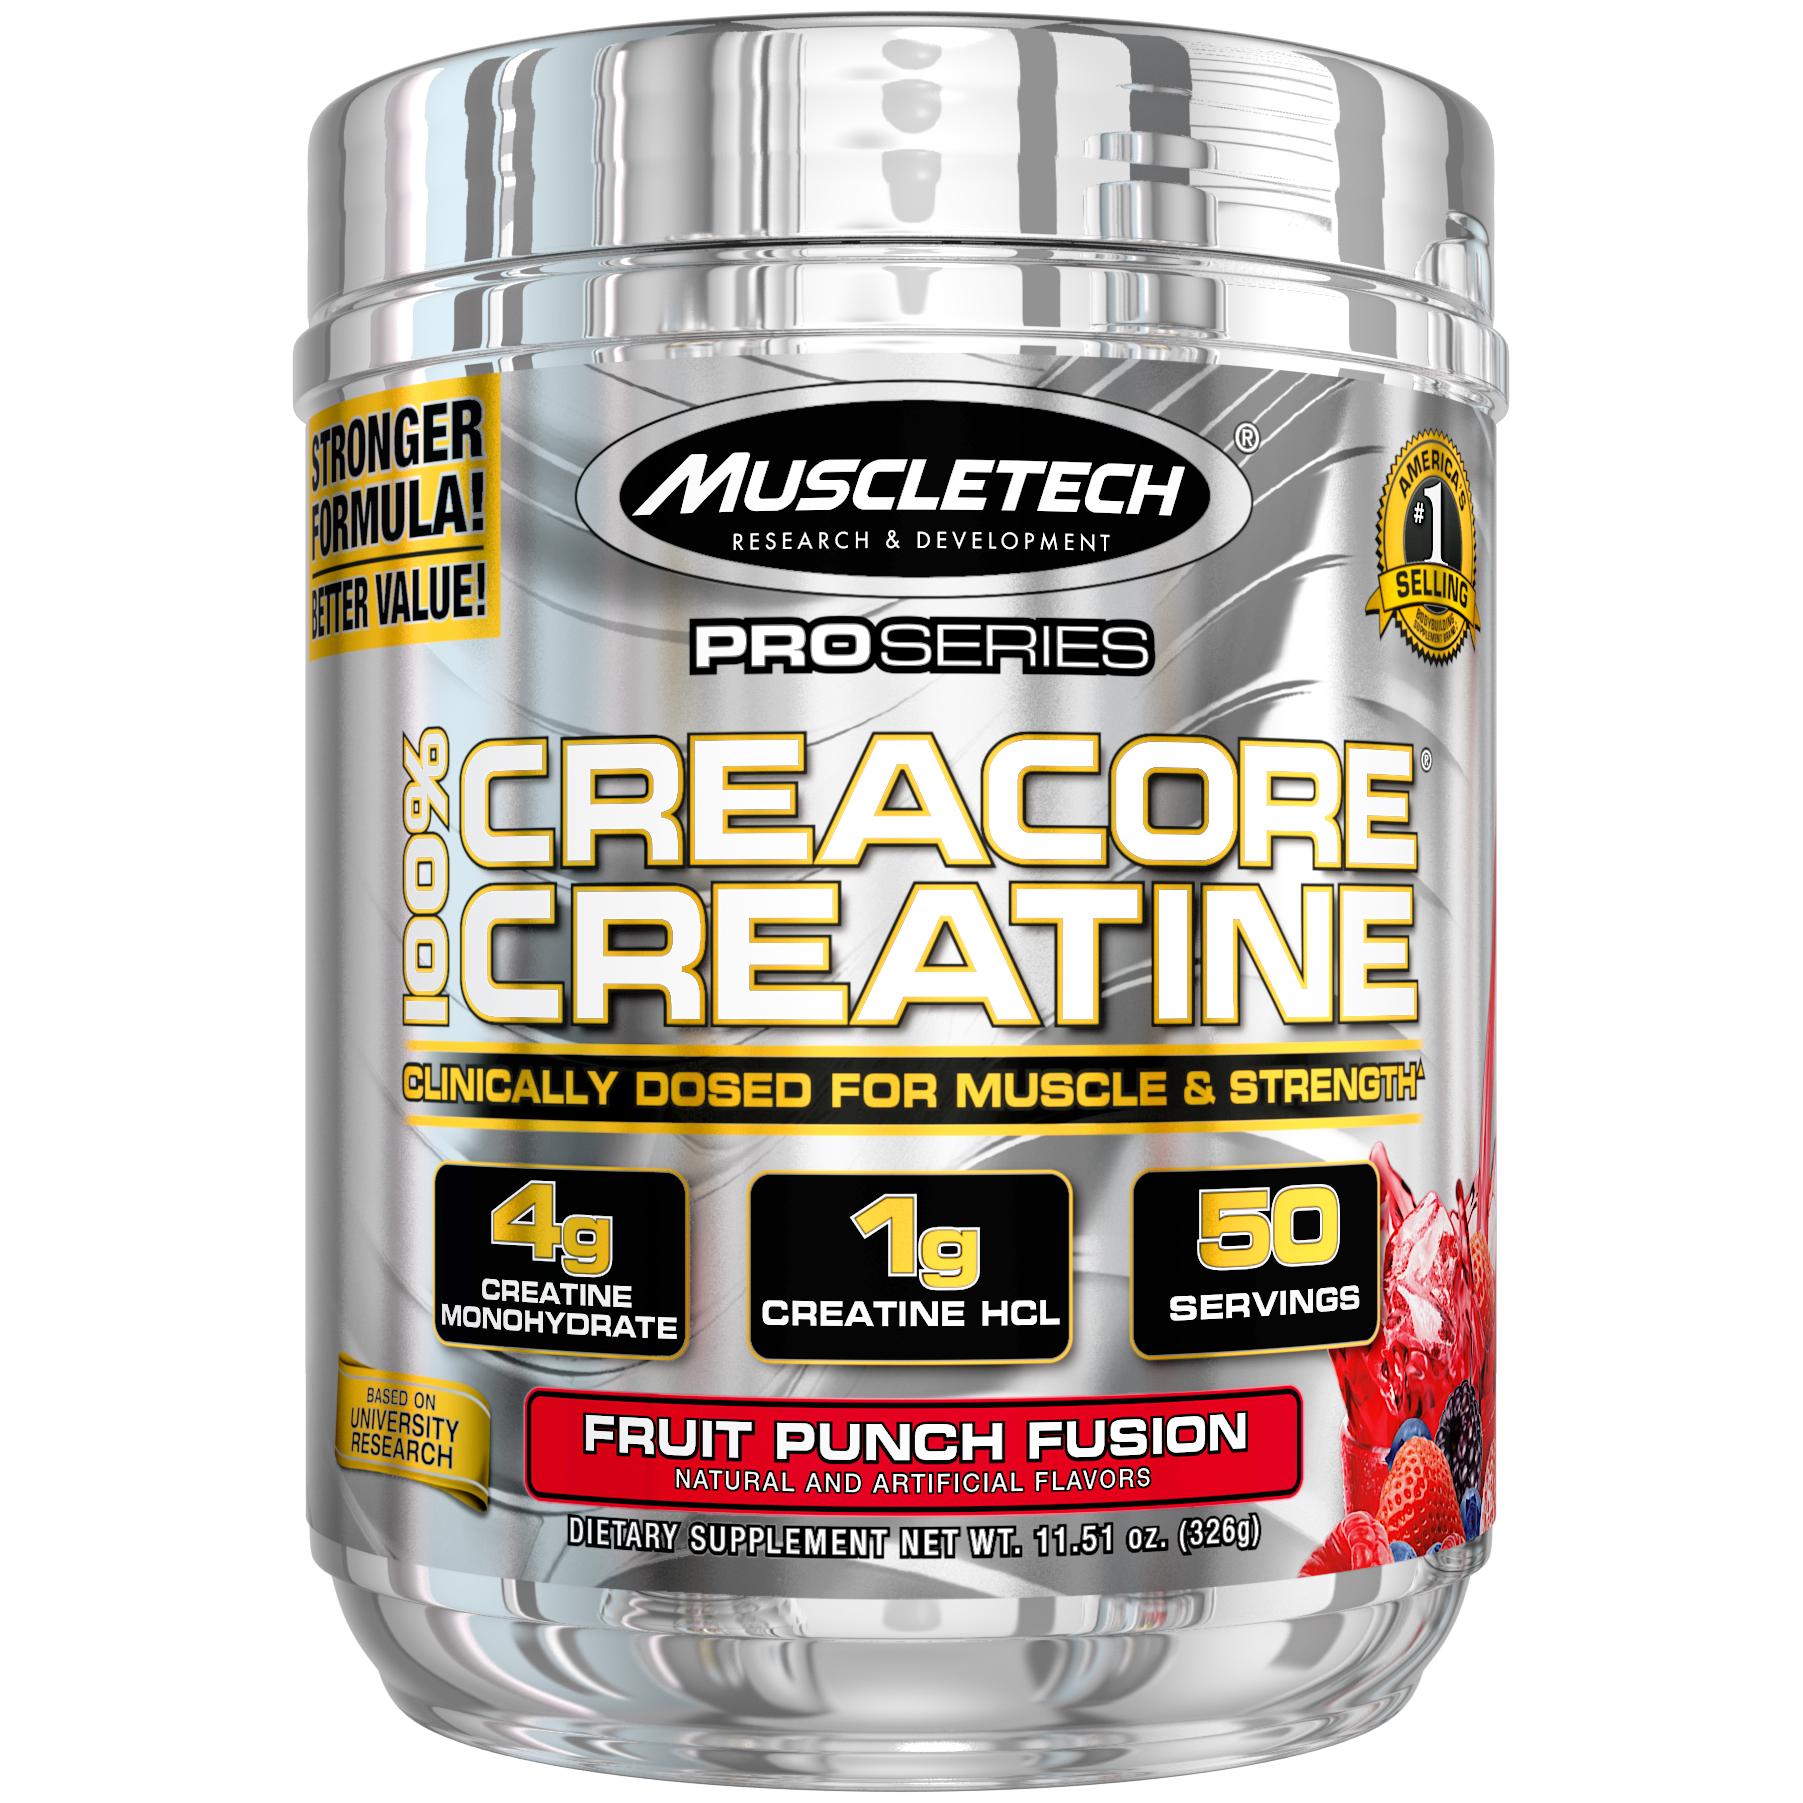 MuscleTech Cell Tech, Creatine Powder, Fruit Punch, 50 Servings